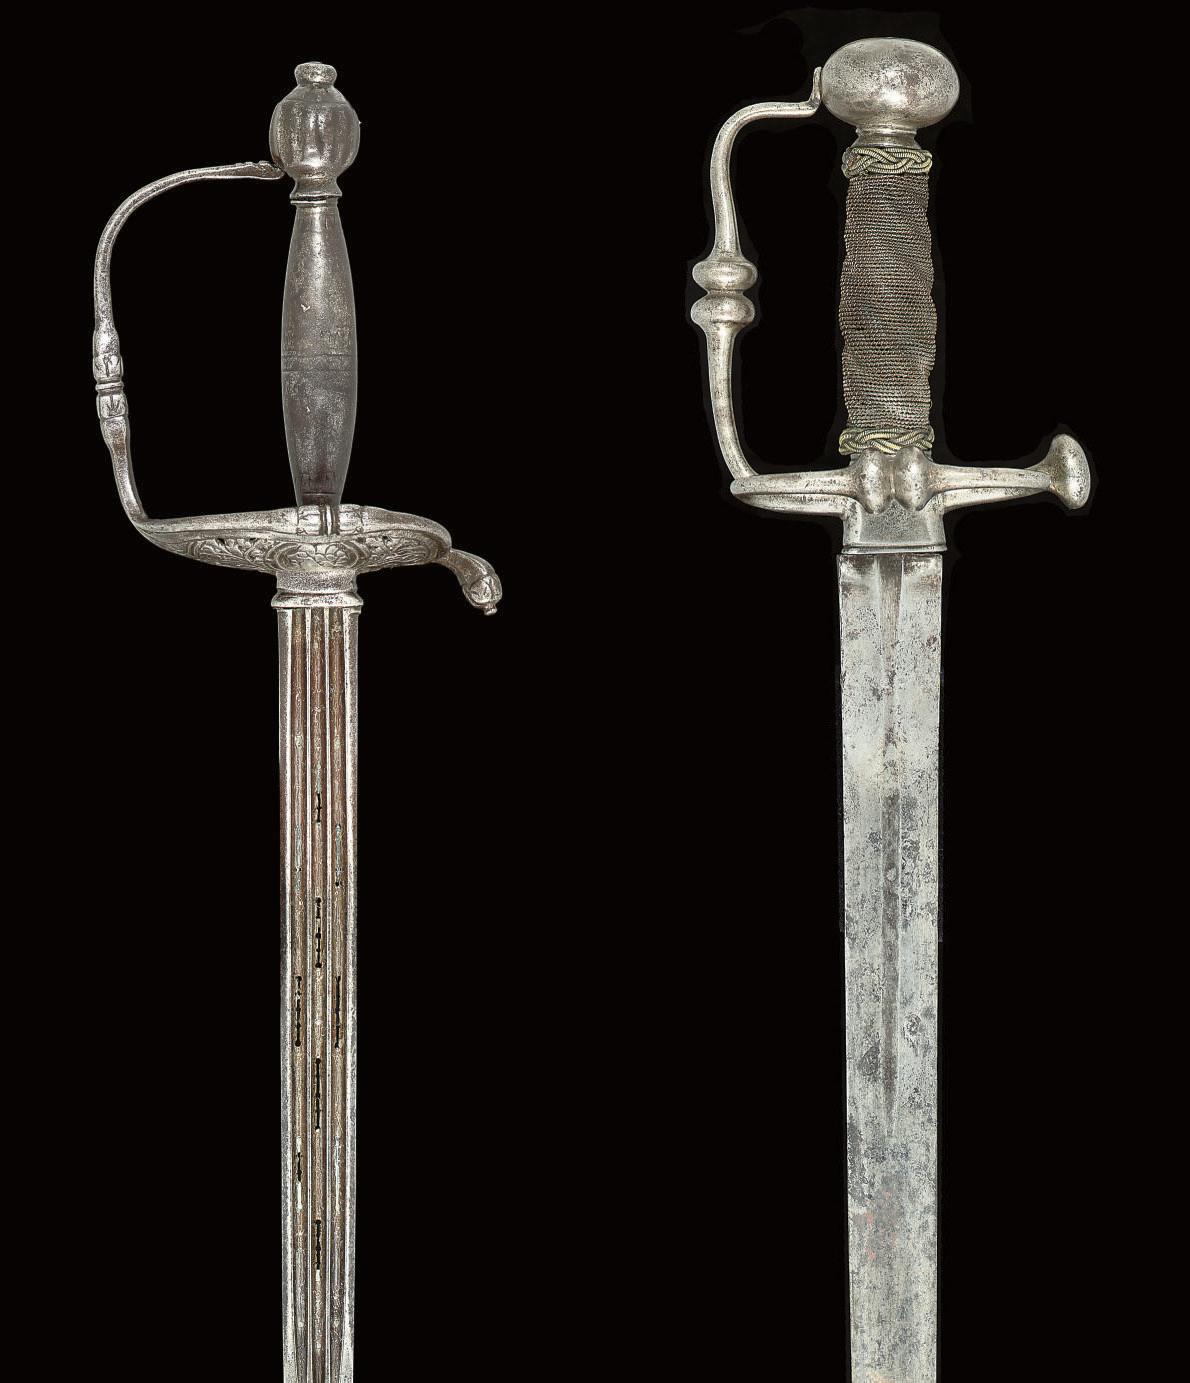 A NORTH EUROPEAN SMALL-SWORD,